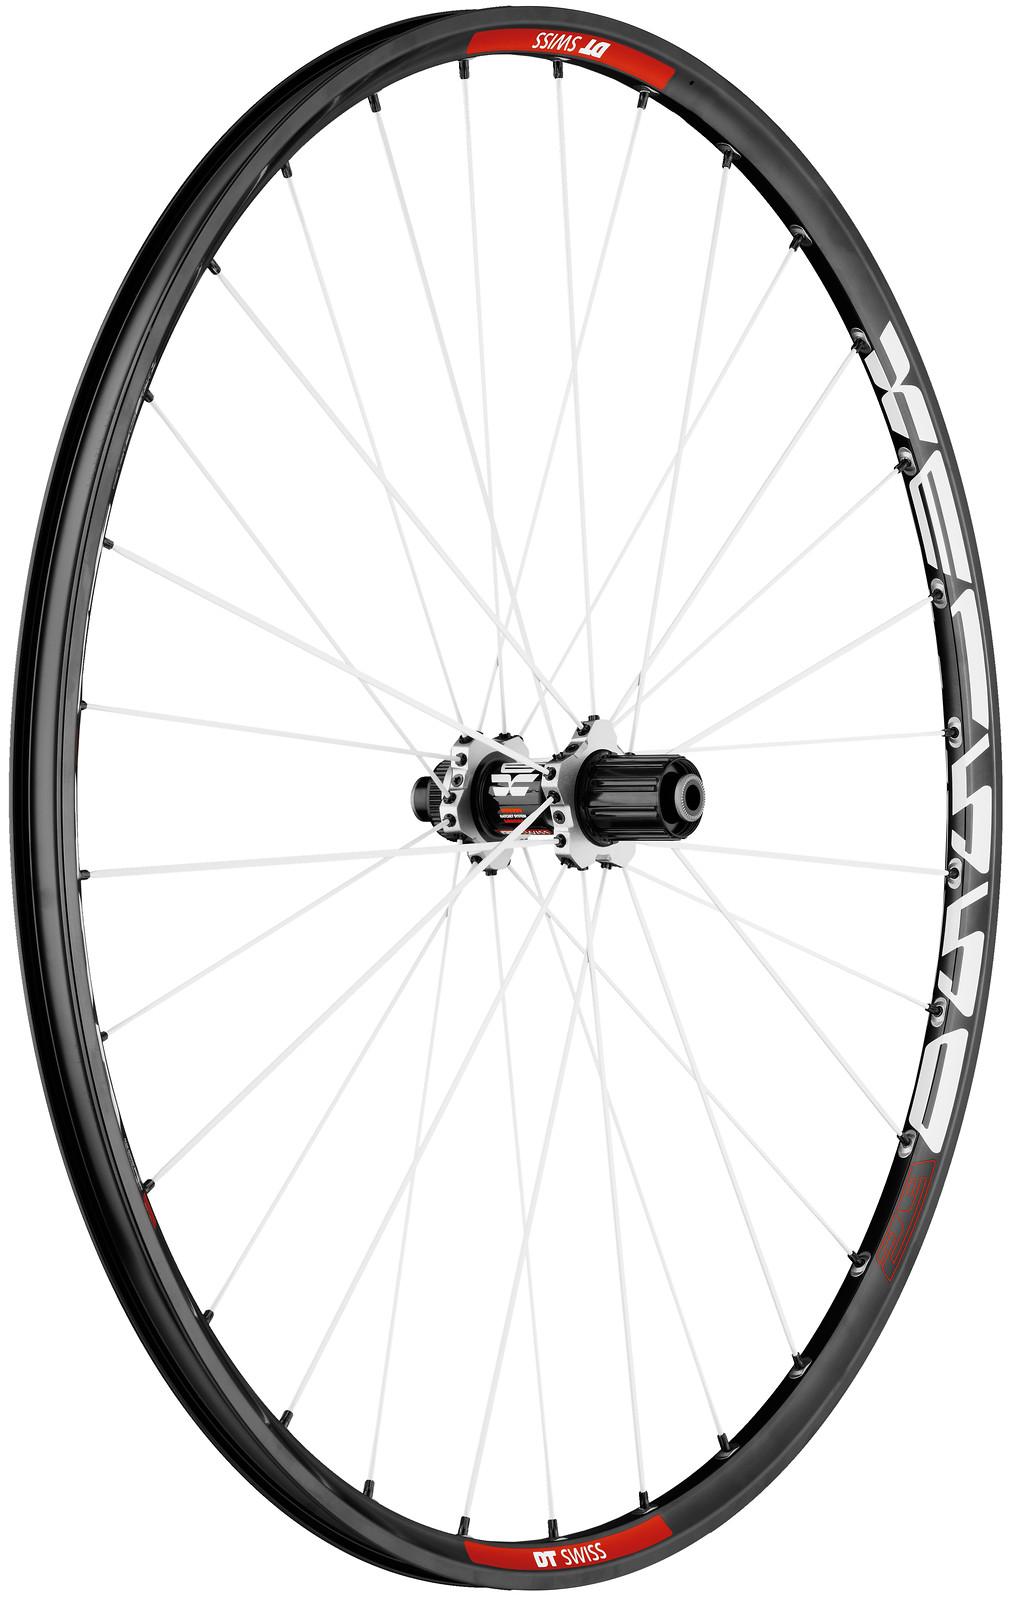 "DT Swiss  XM1550 Tricon 29"" Wheelset  PHO_XM_1550_TRICON_29_BLACK_TA_10_135_RW_RGB"